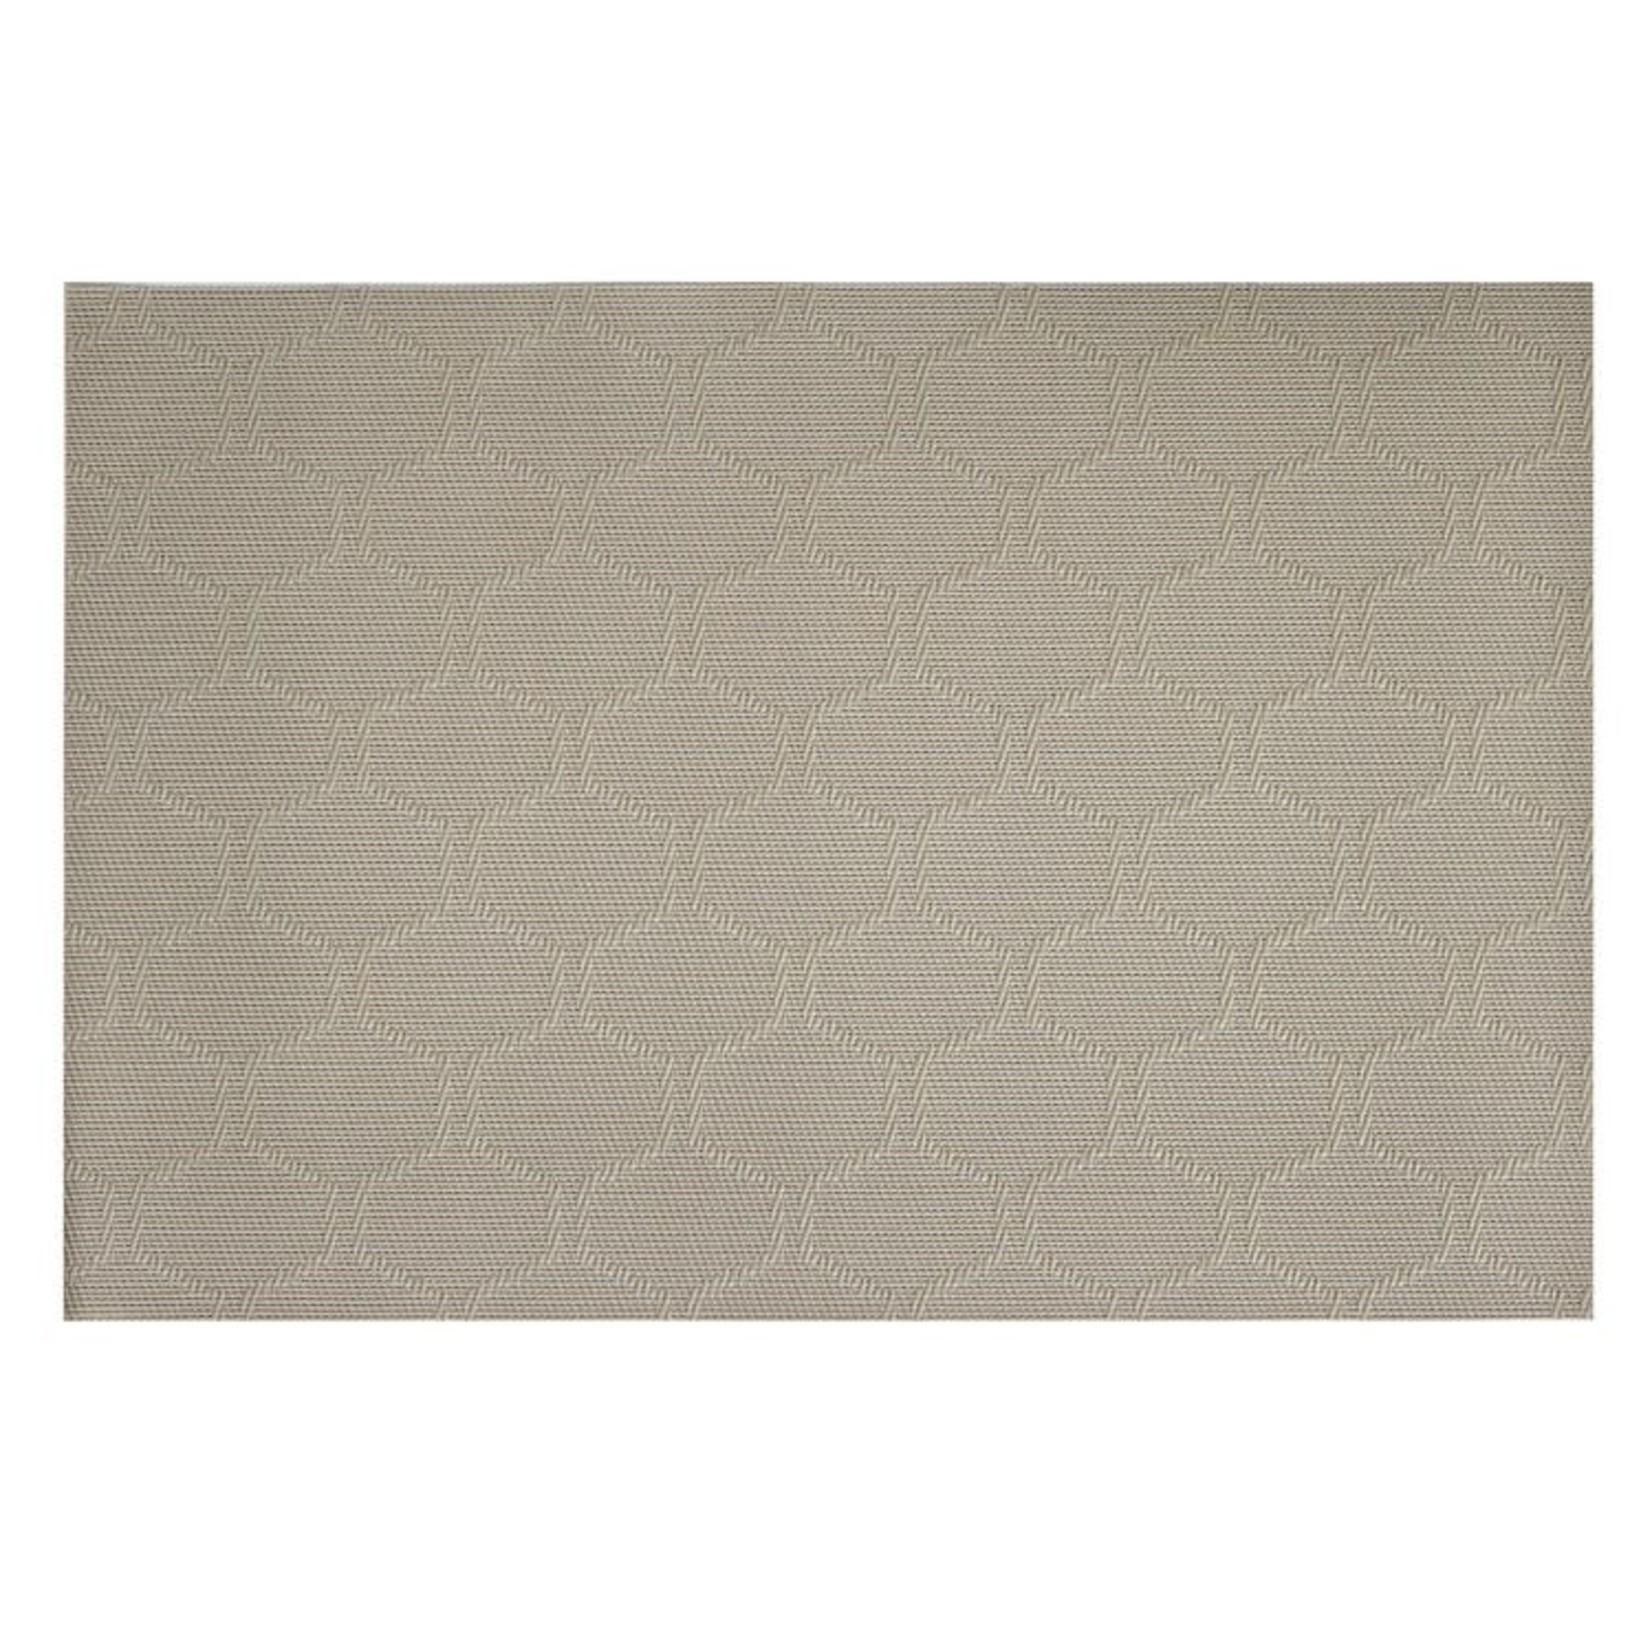 Honeycomb Vinyl Placemat Grey